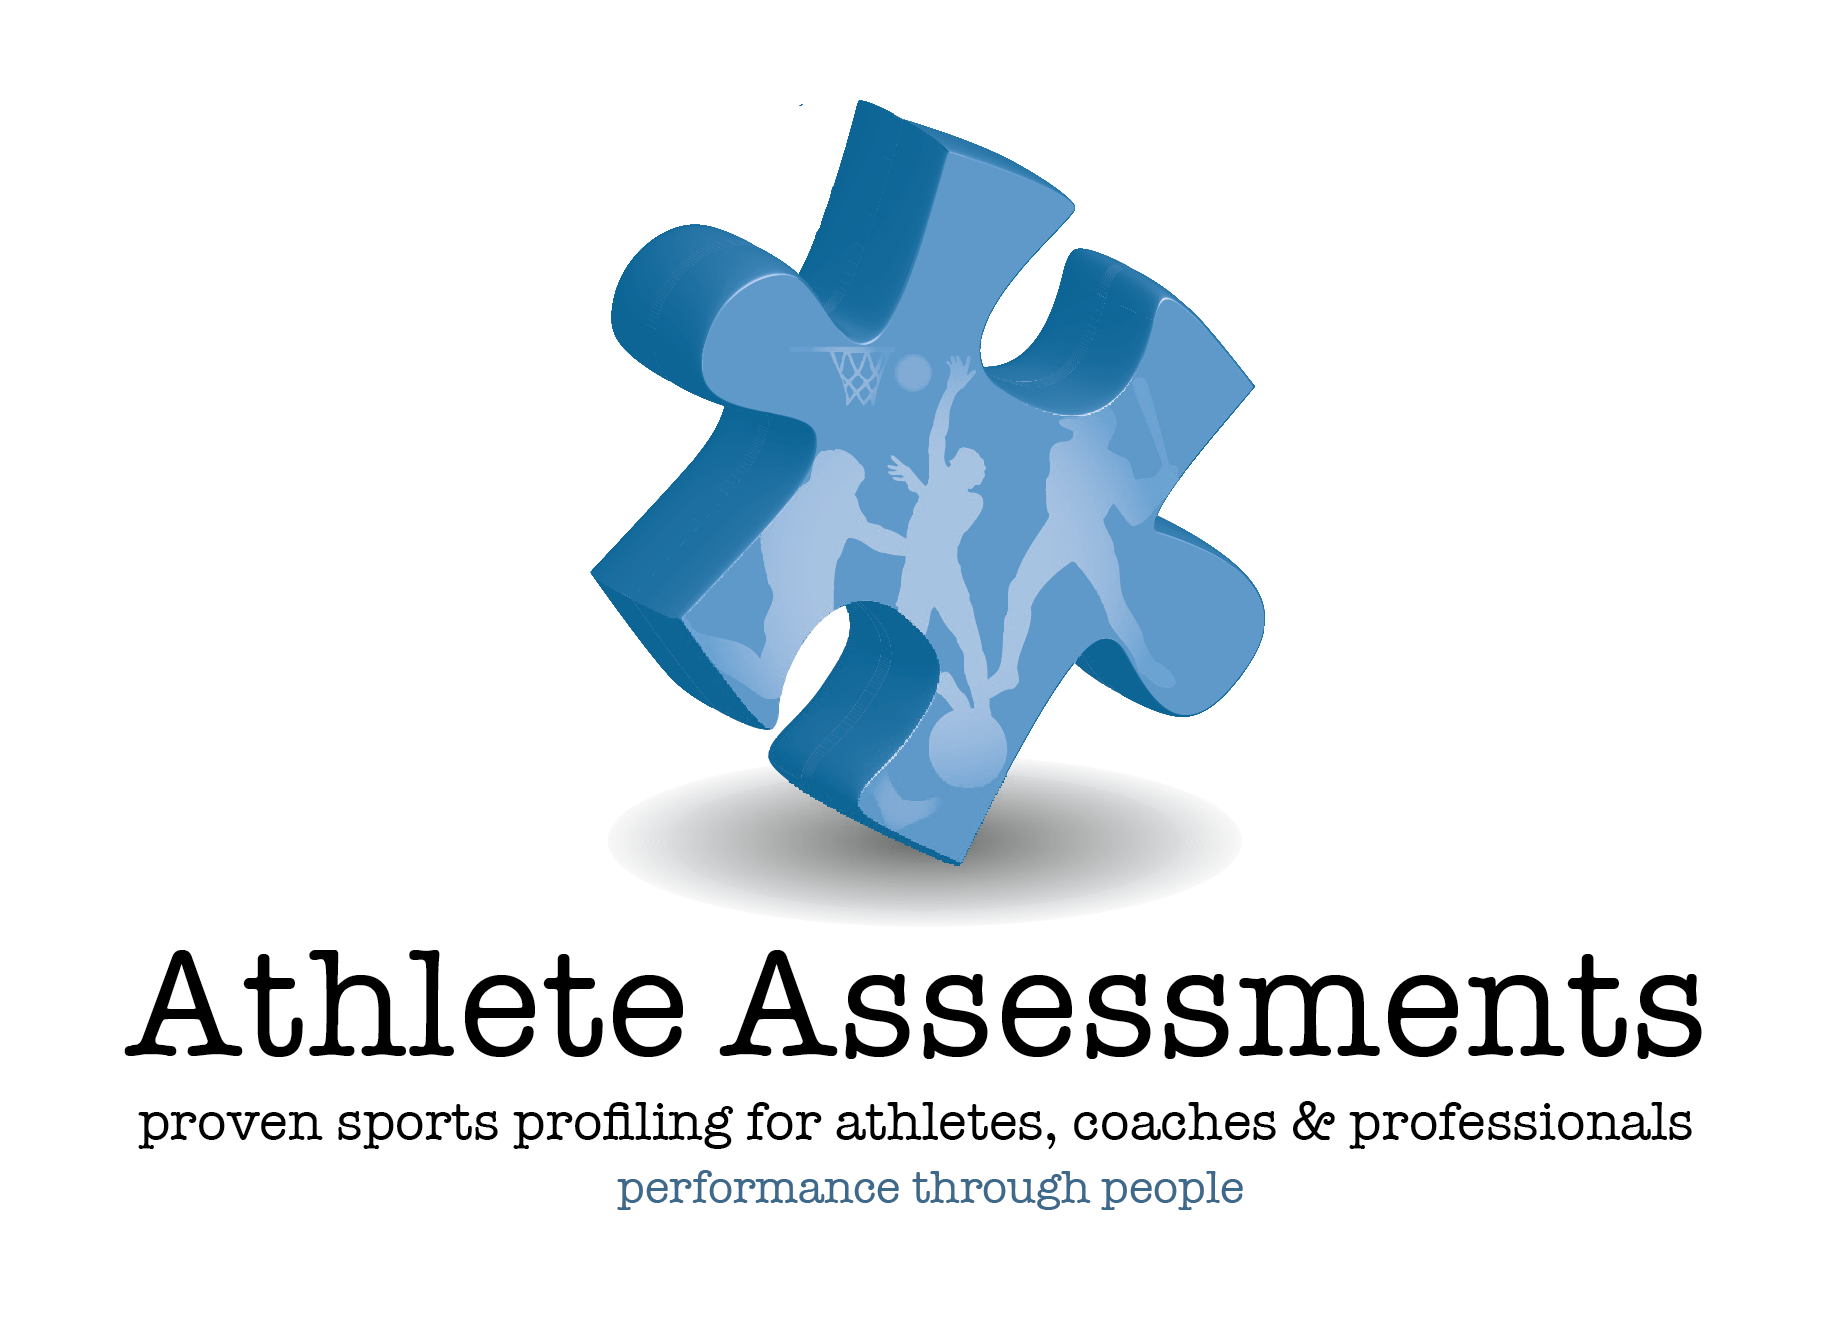 Athlete Assessments logo.png